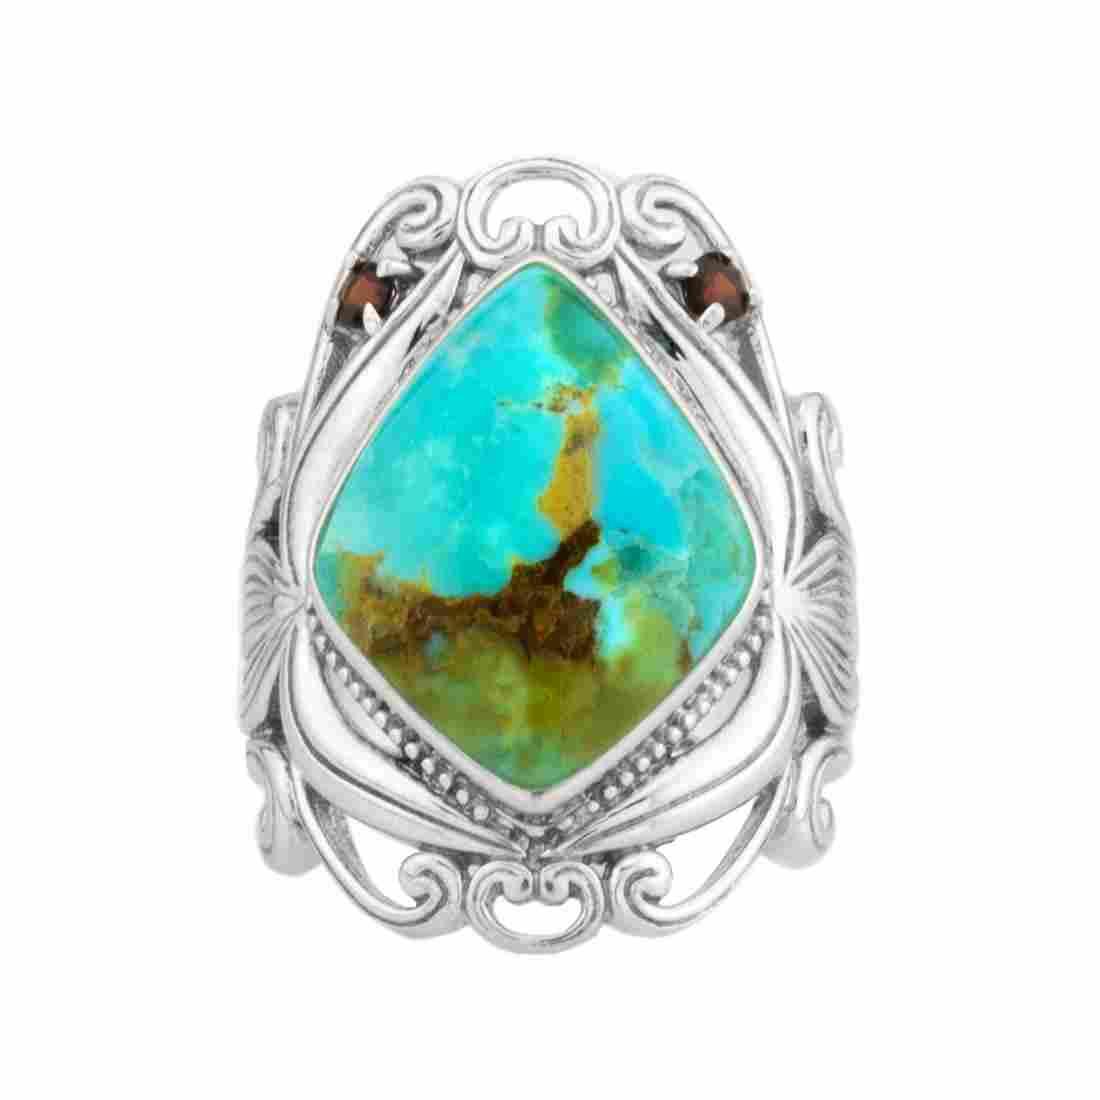 Silver Turquoise & Garnet Scrollwork Ring-SZ 5